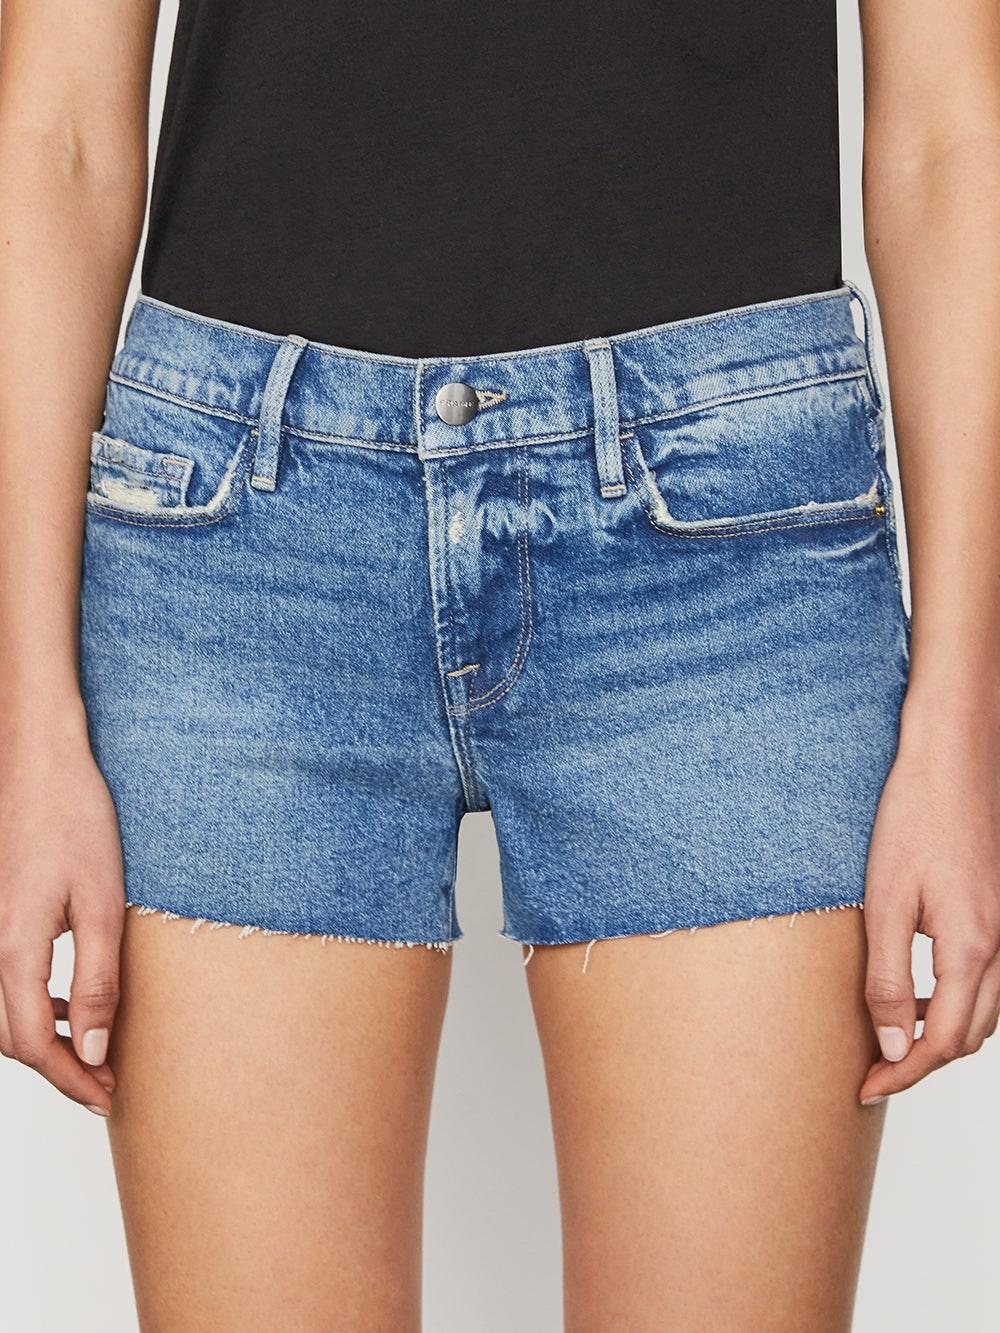 jeans front detail view alt:hover